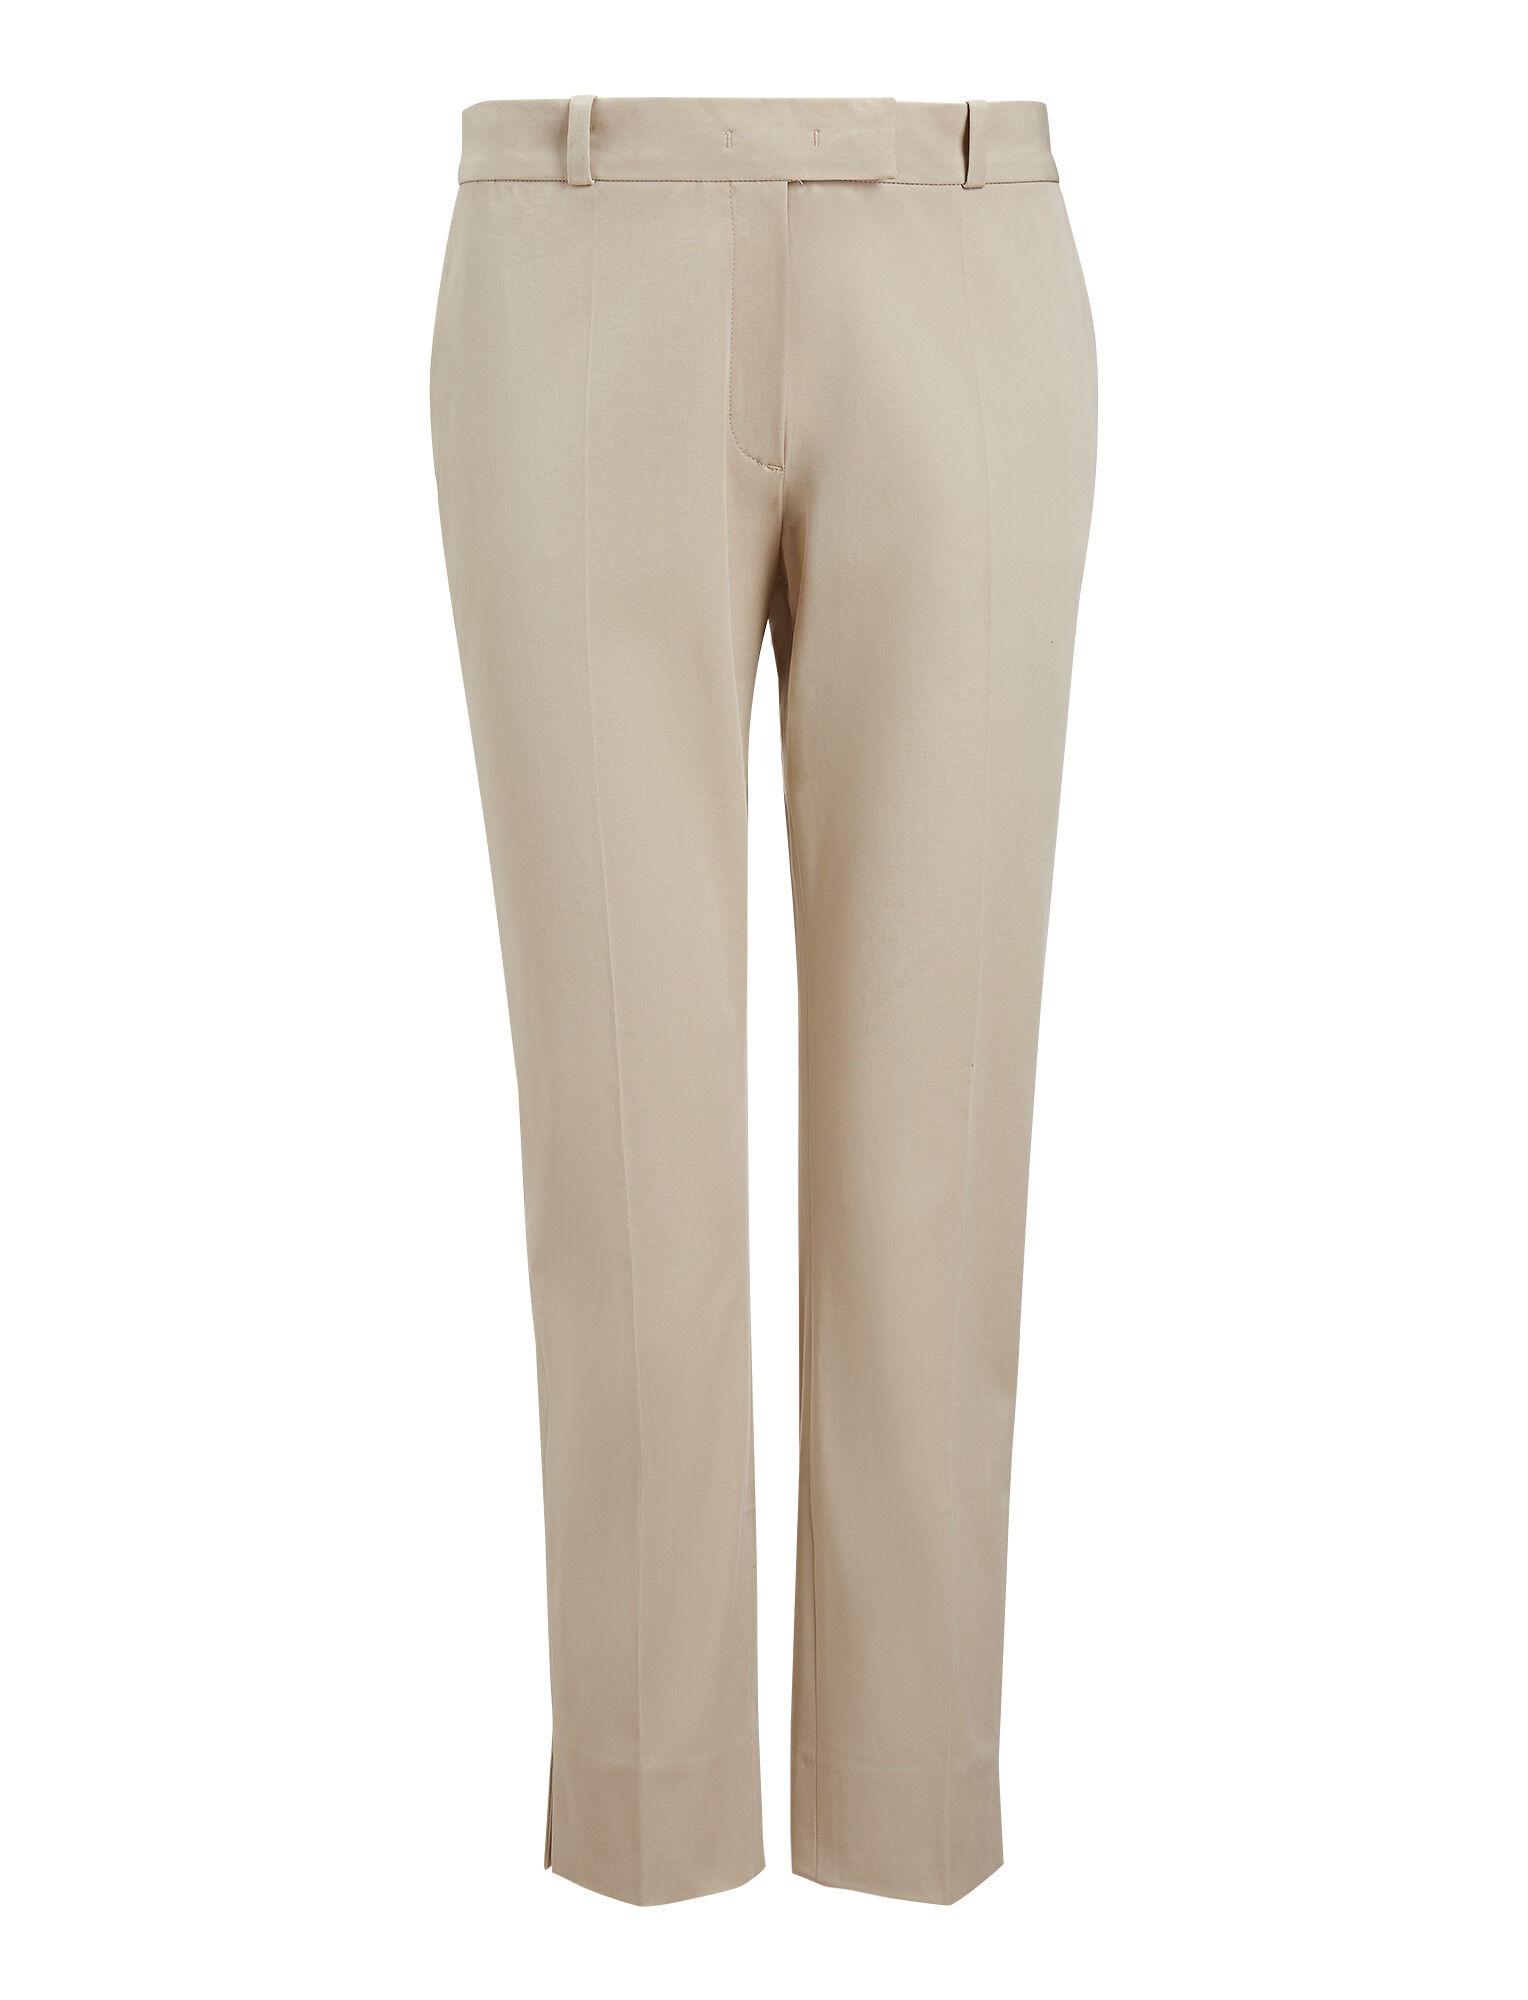 Joseph, Bing Court Polish Cotton Trousers, in STONE